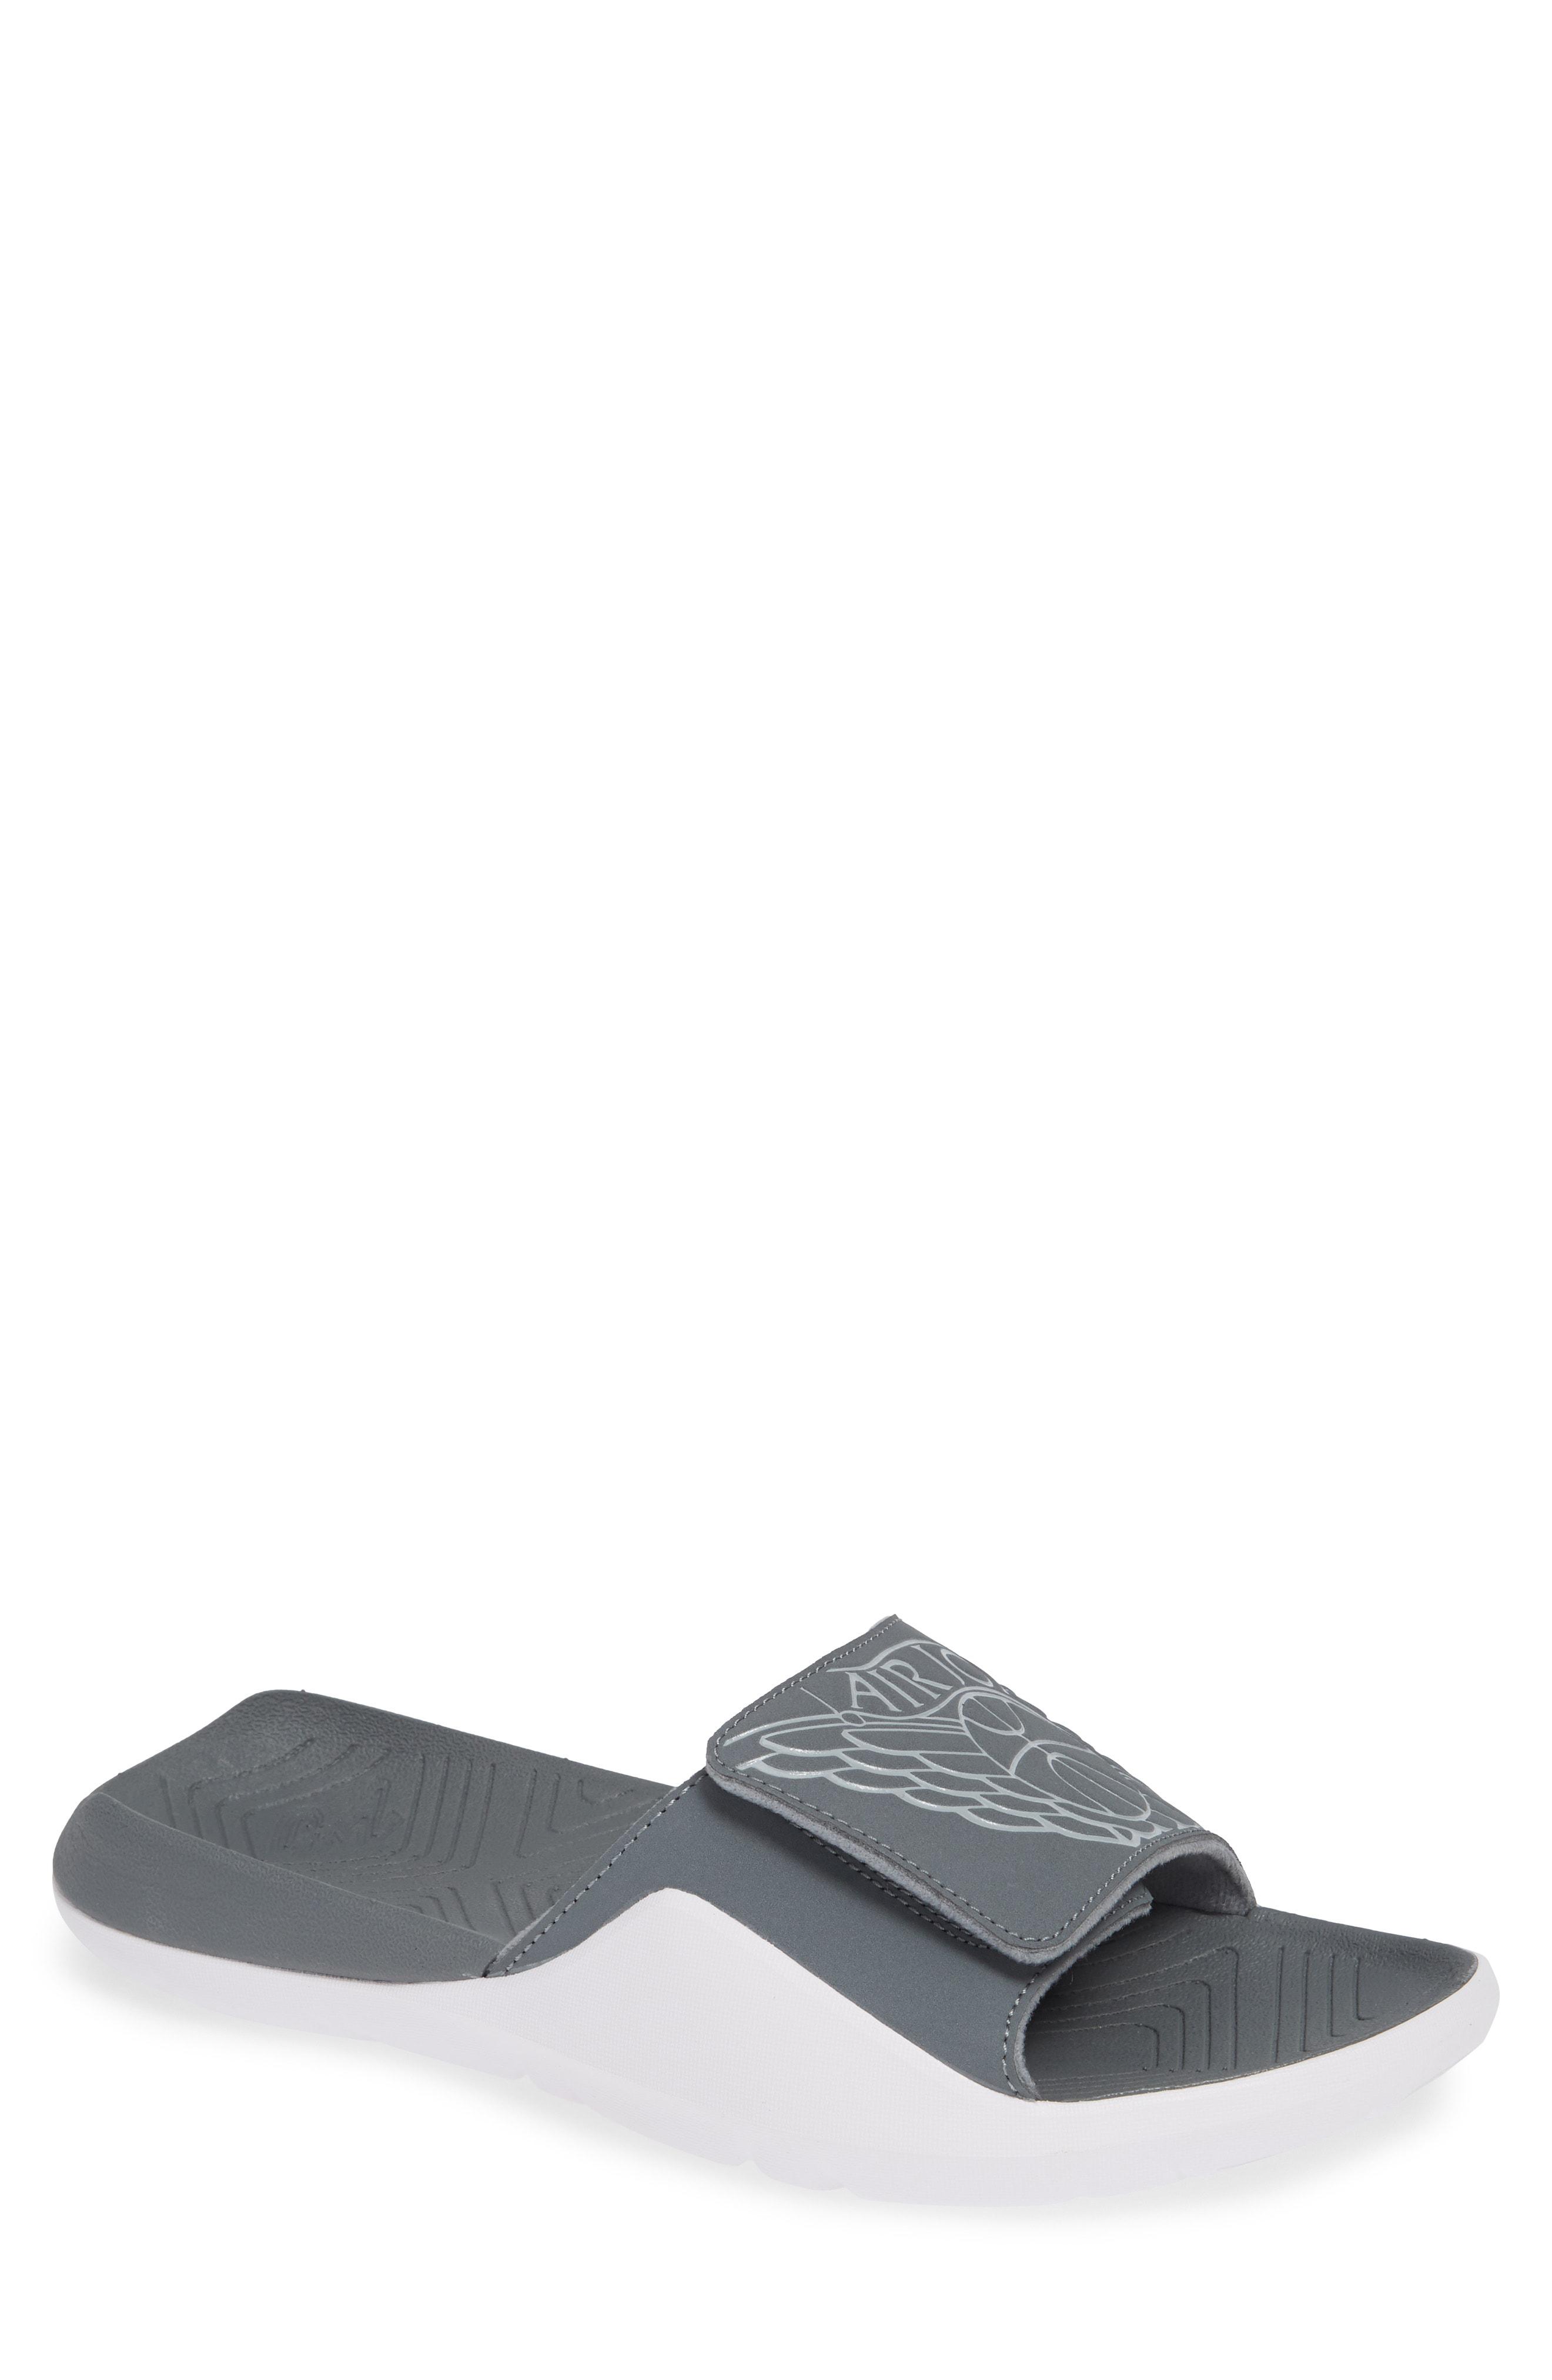 566de2dfb40e9c Nike Jordan Hydro Sport Slide Sandal In Smoke Grey  White